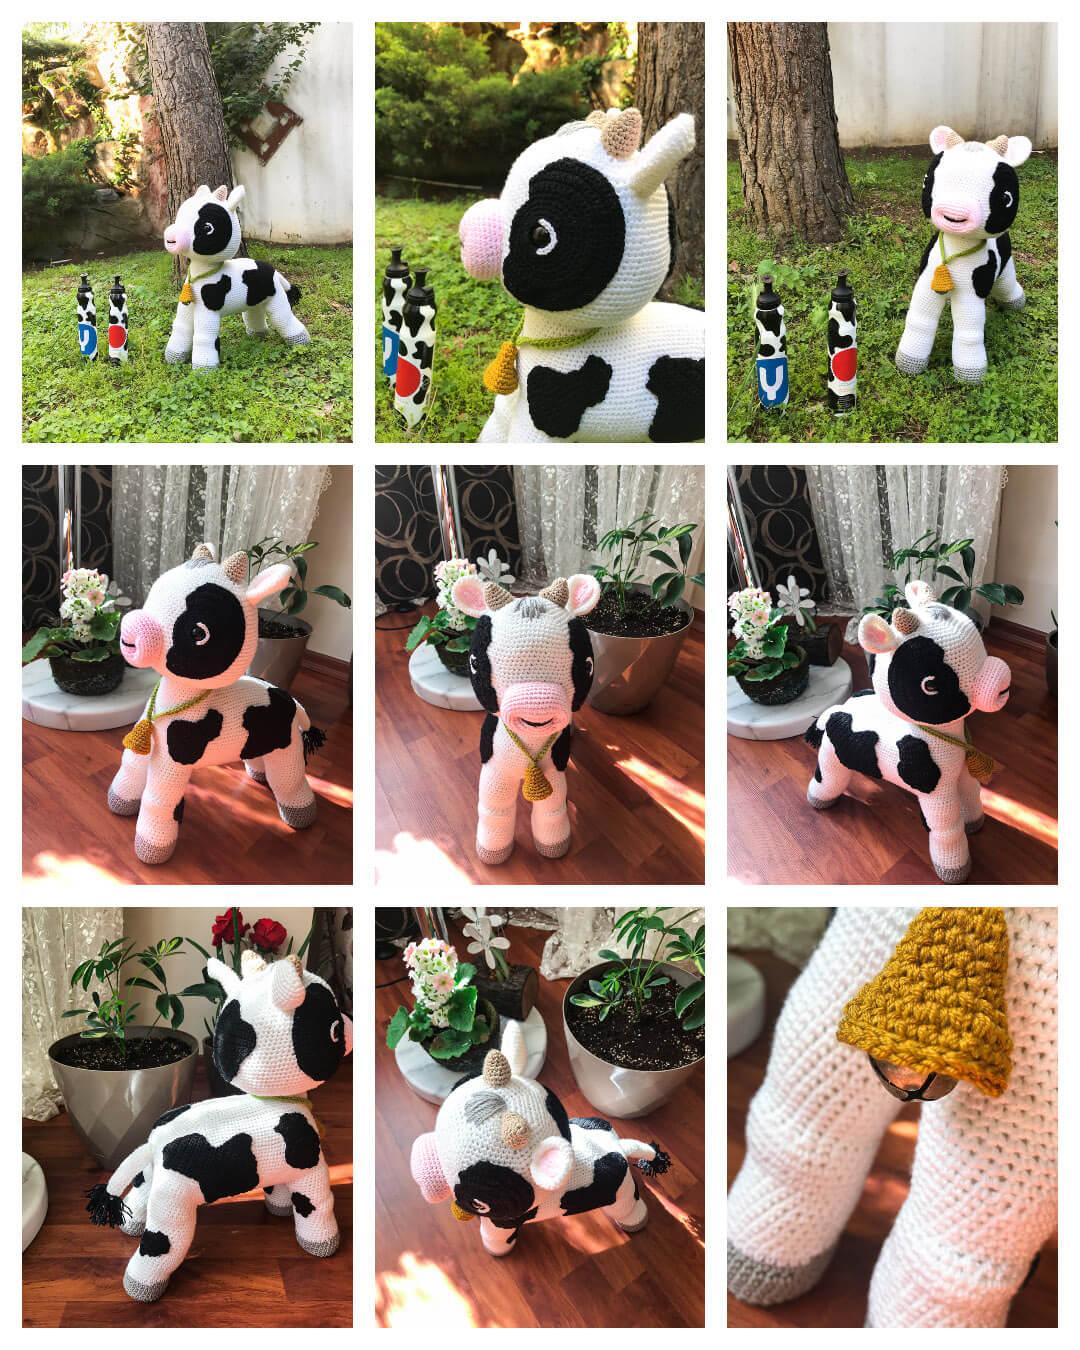 Amigurumi Panda'lı Örgü Çanta Modeli Yapılışı ( Anlatımlı ) – Örgü ...   1350x1080